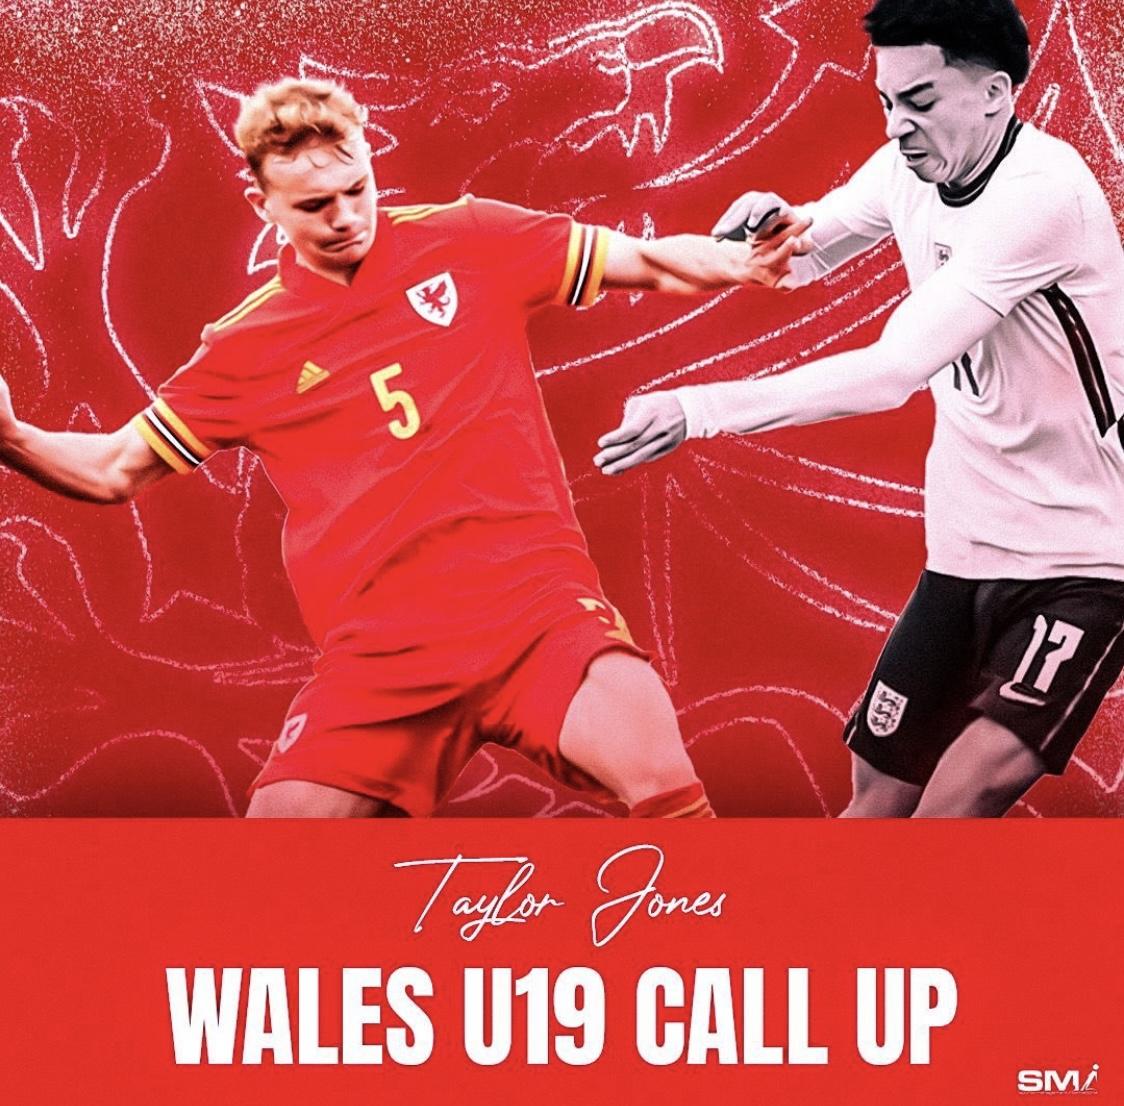 Taylor Jones Wales call up